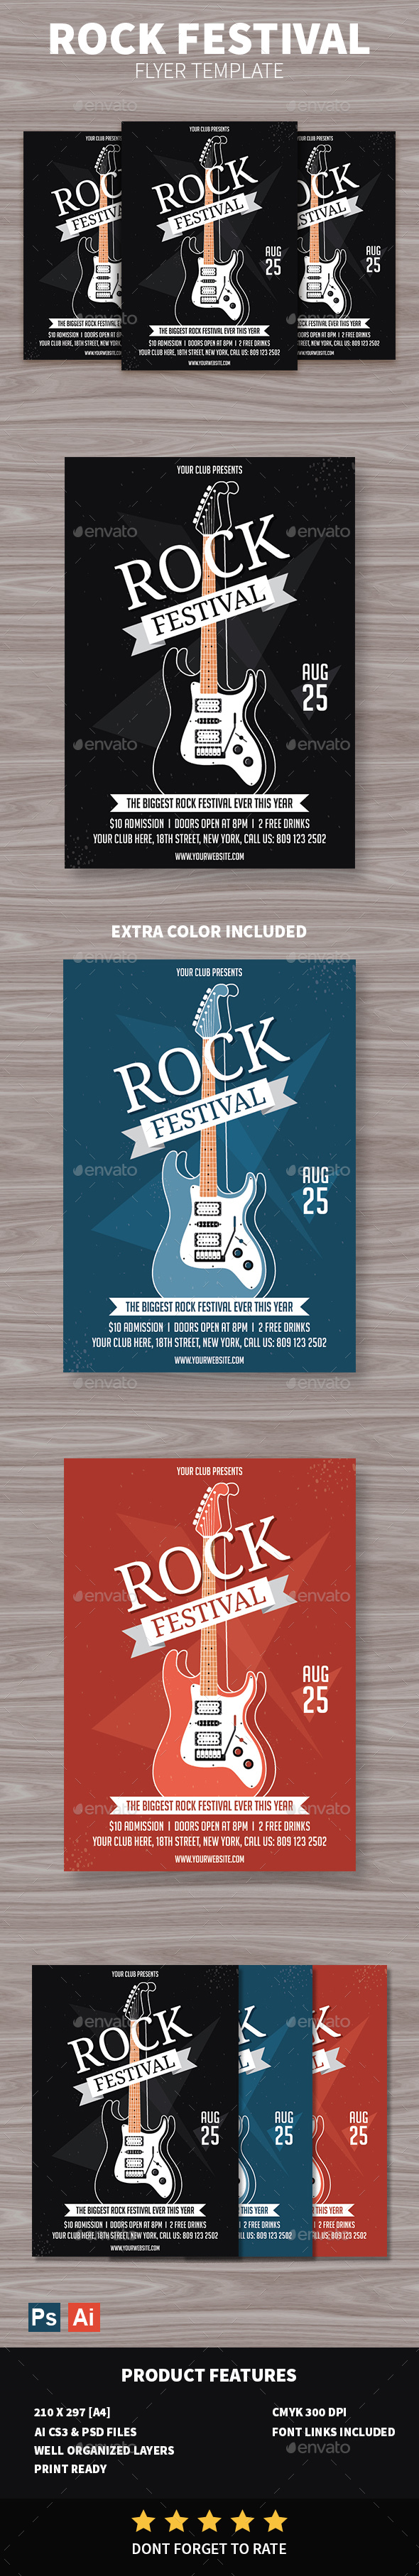 Rock Festival Flyer - Concerts Events